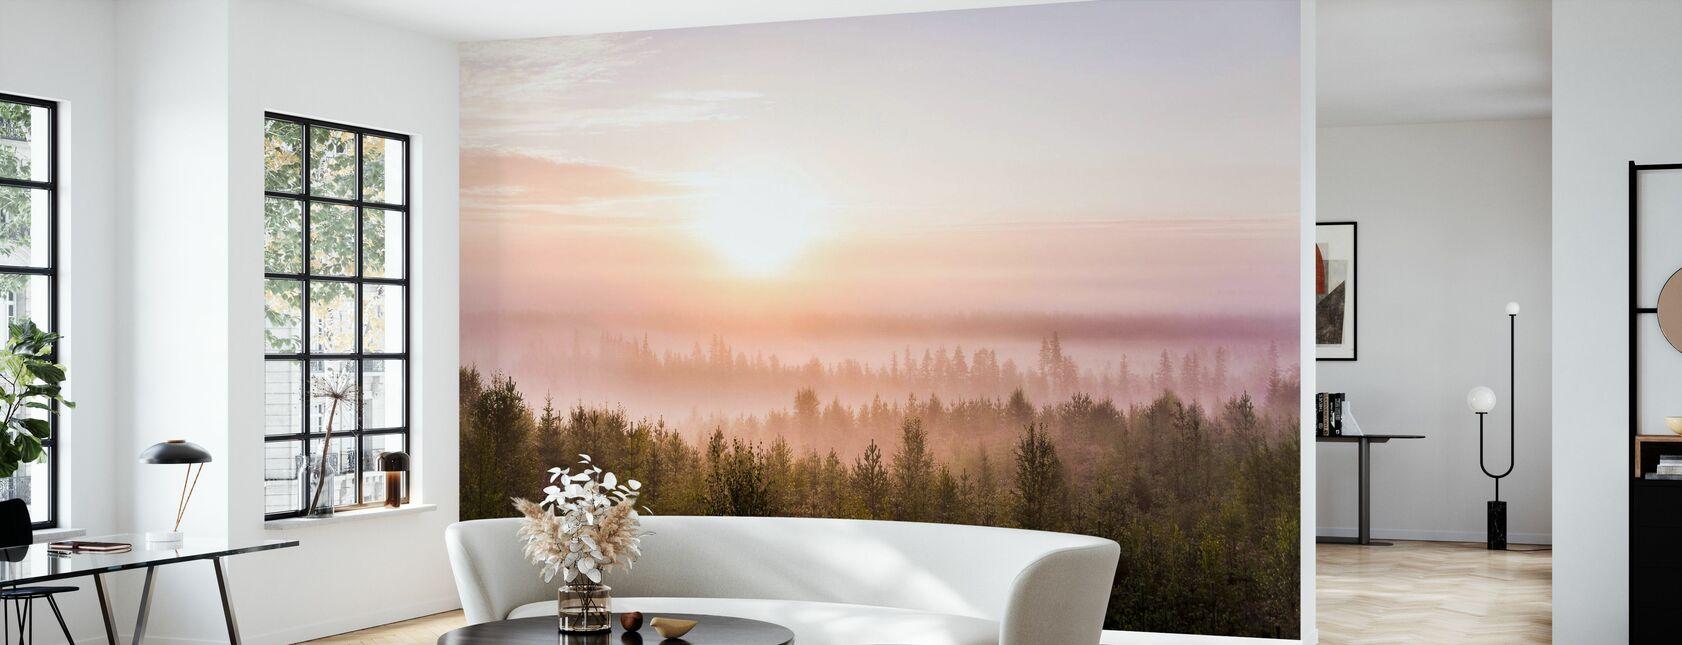 Méditation du matin - Papier peint - Salle à manger